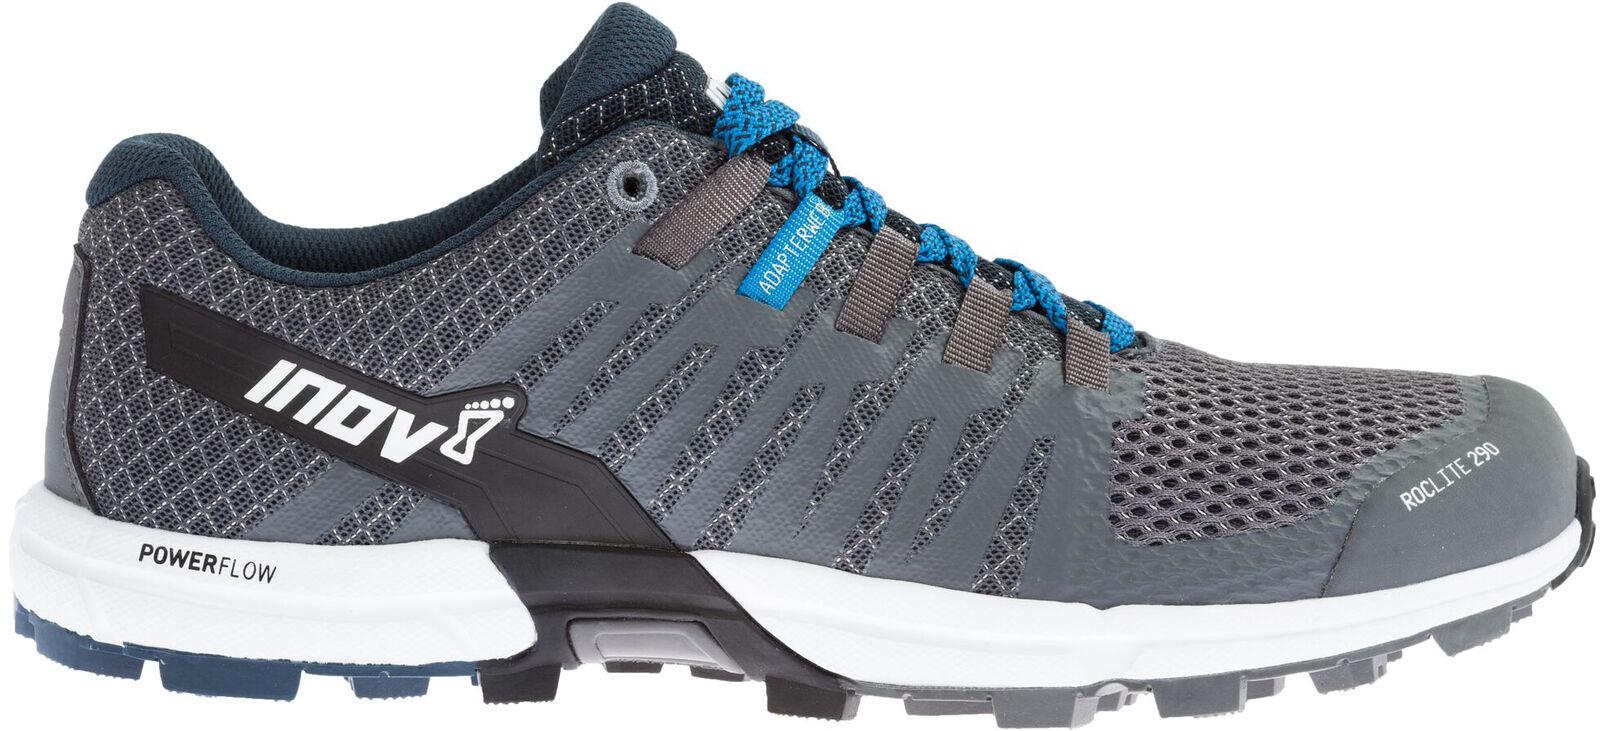 Inov8 Roclite Herren 290  Herren Roclite Trail Running Schuhes - Grau c1cf23